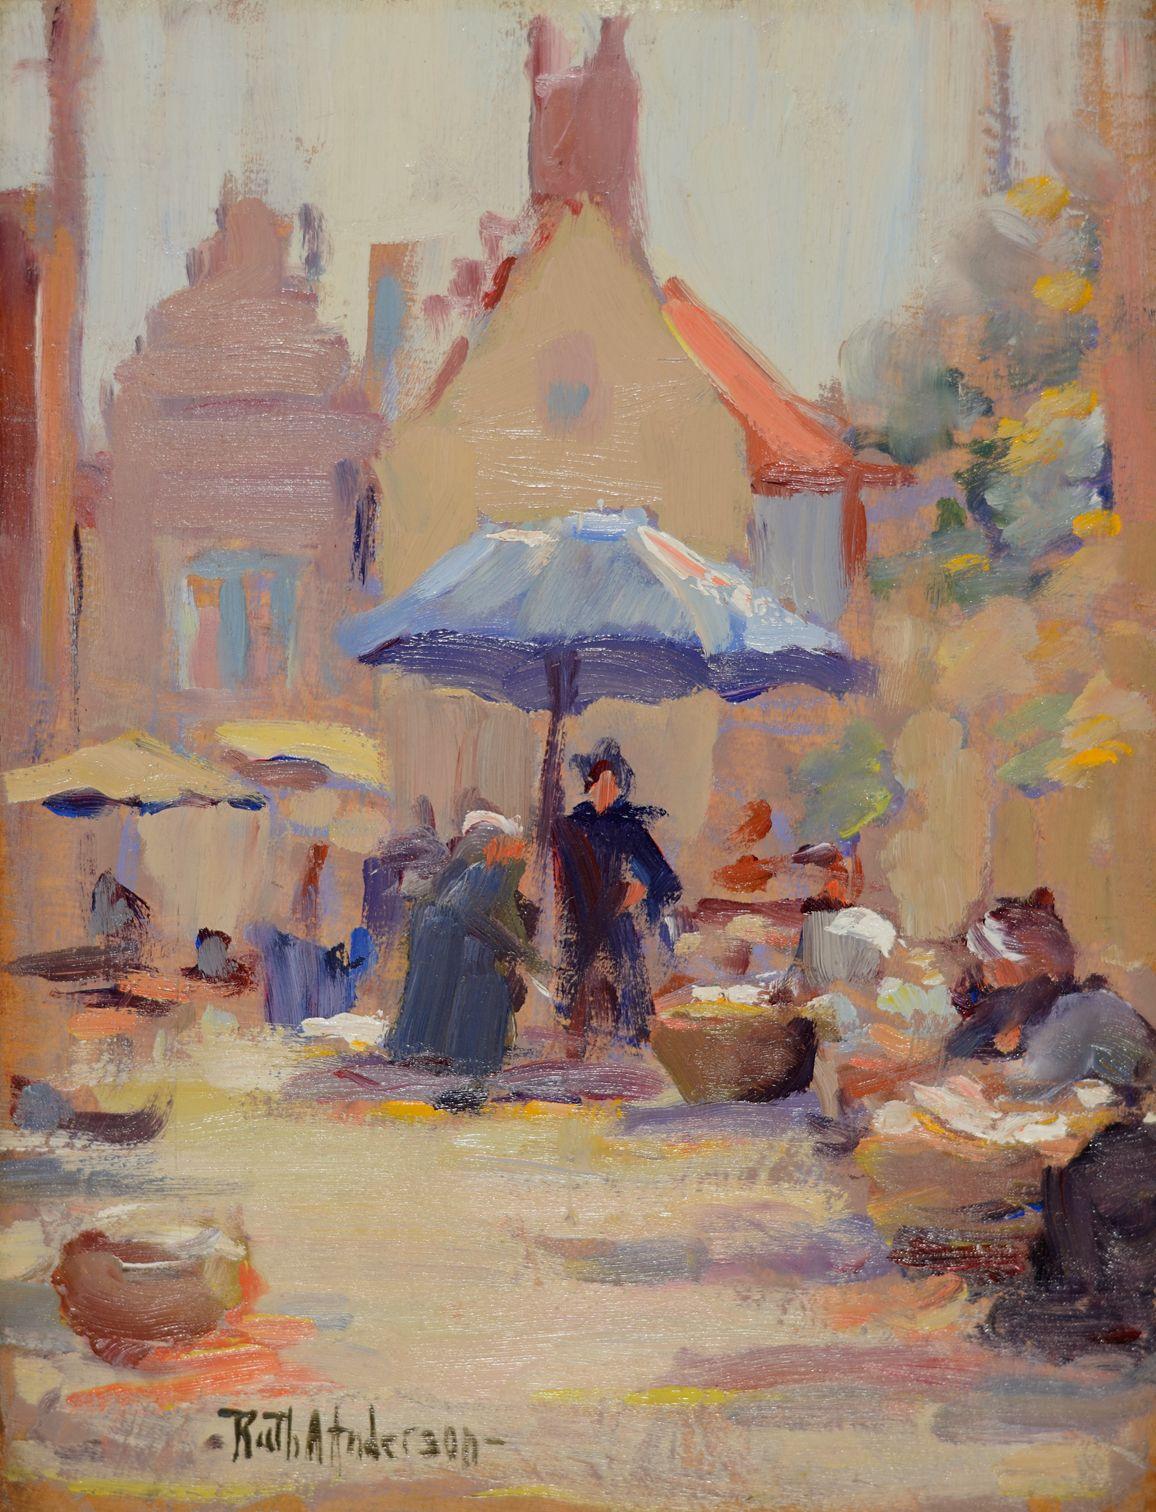 Ruth Anderson, Fish Market Bruges